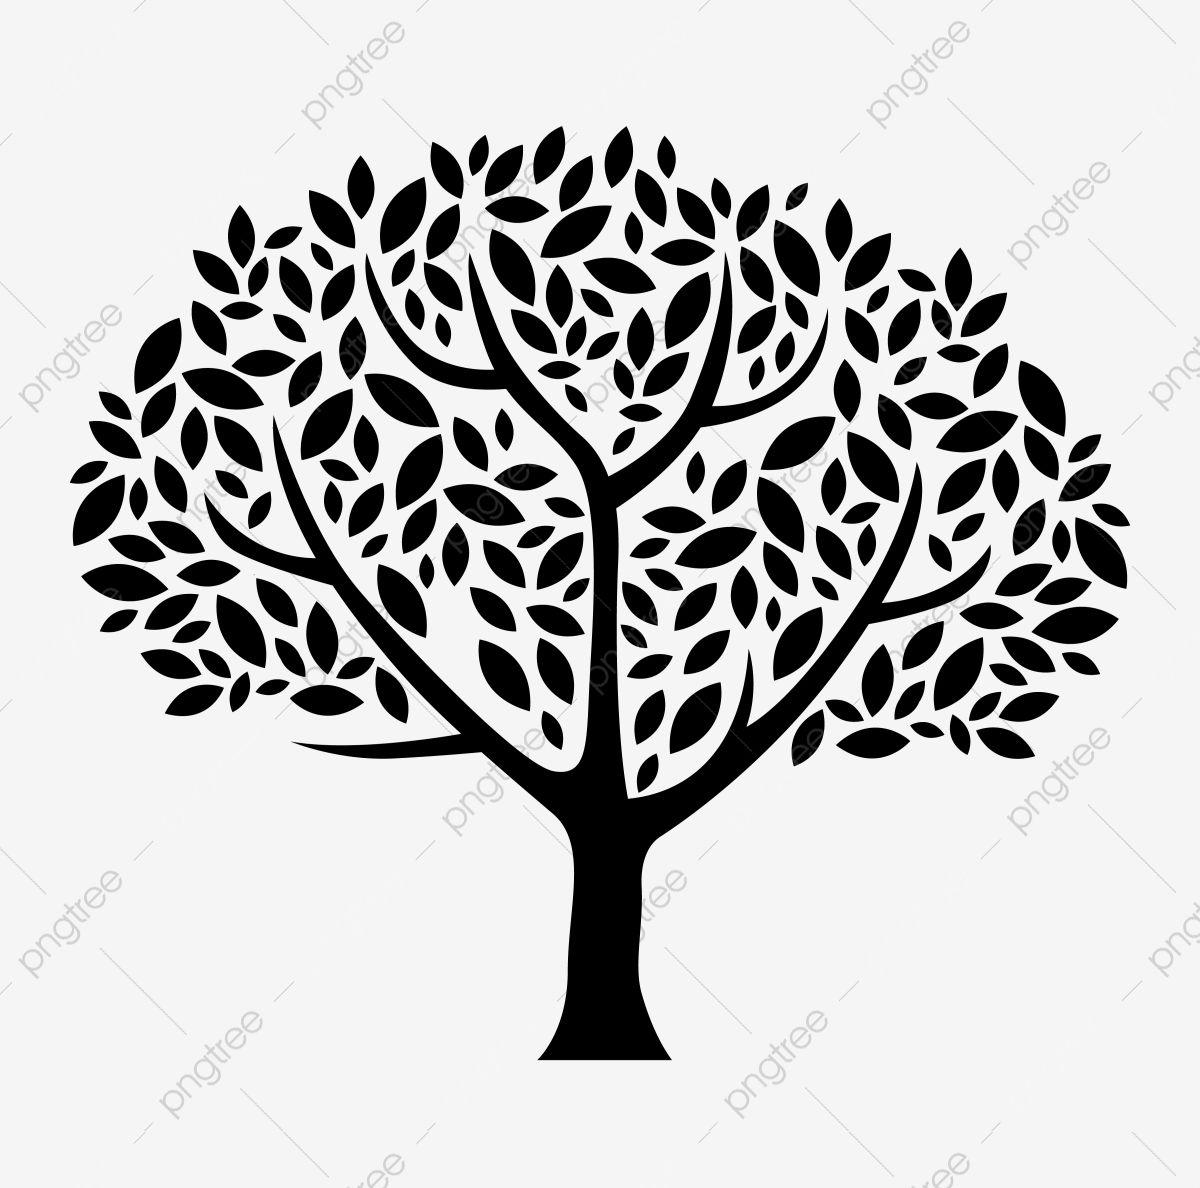 Pin On Tree 1